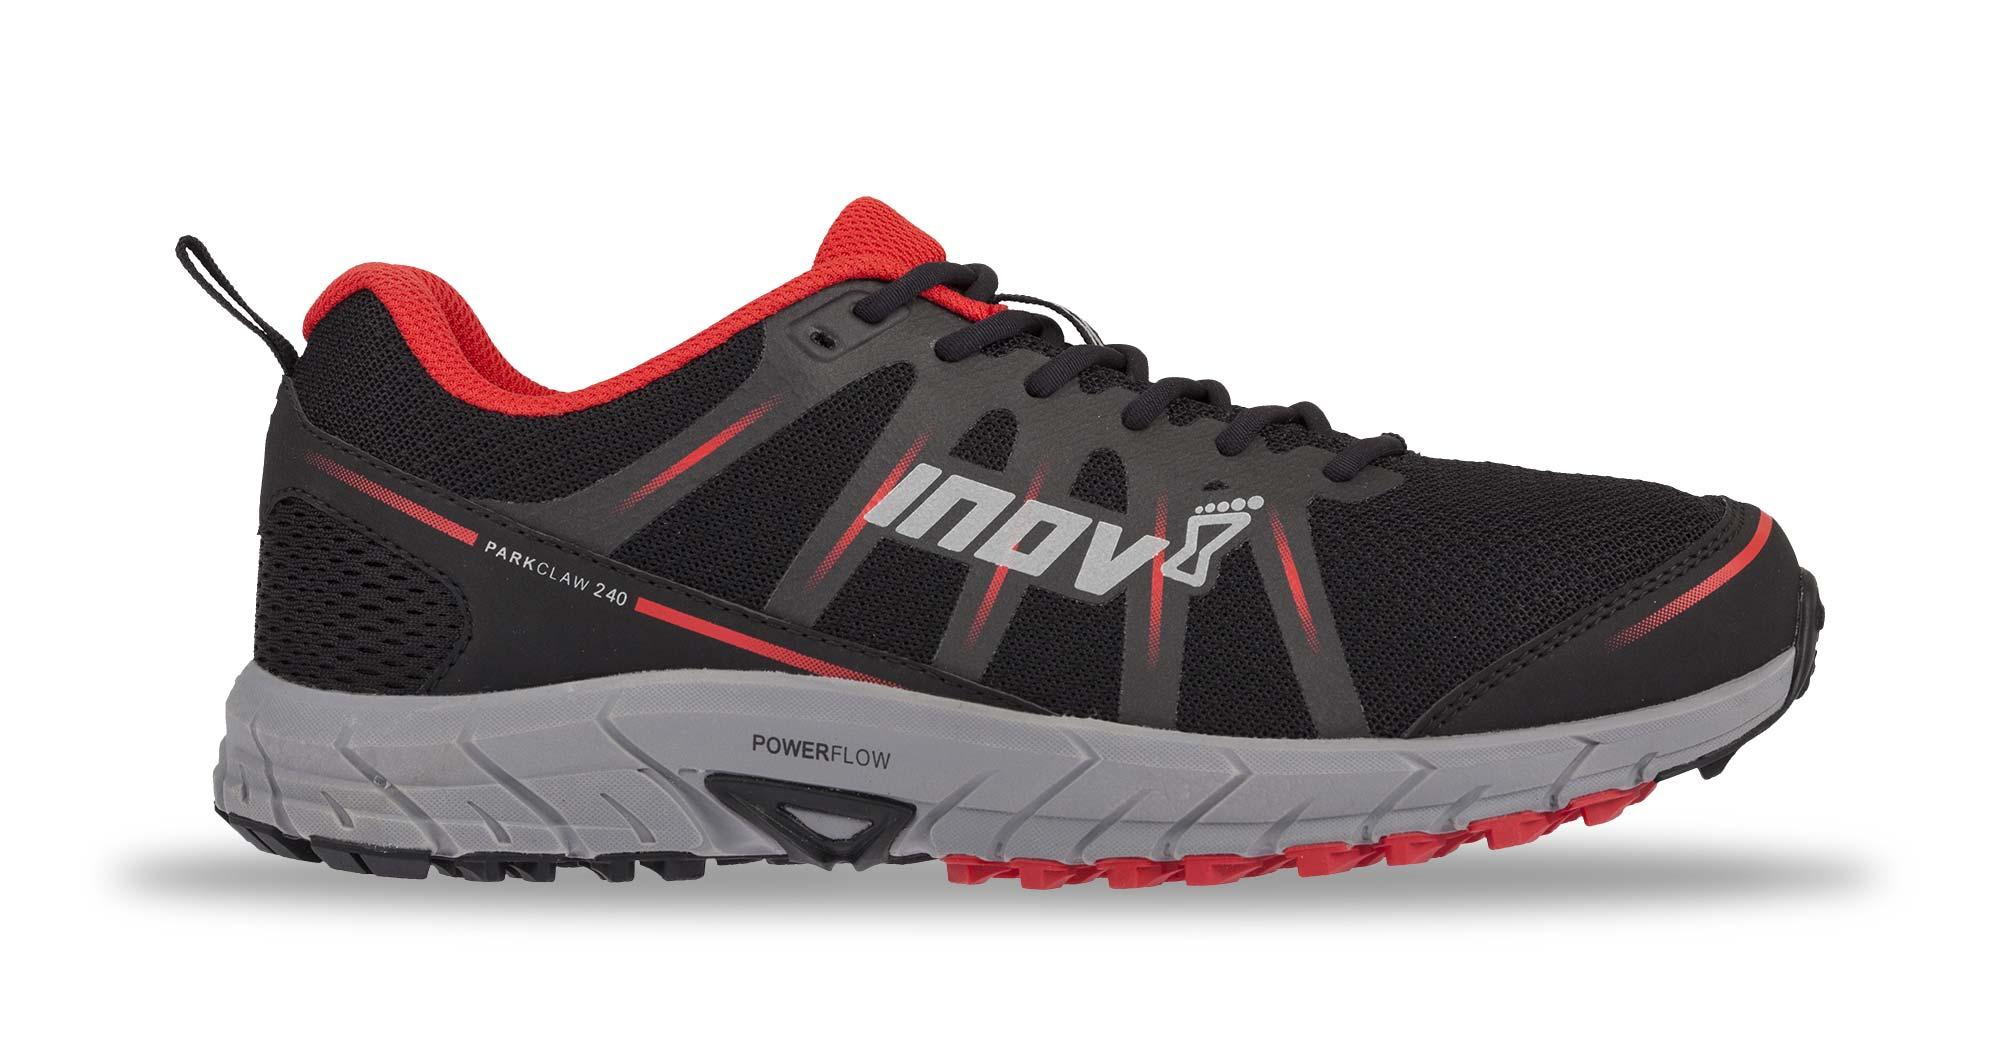 Parkclaw 240 Men's Running Shoe   inov-8